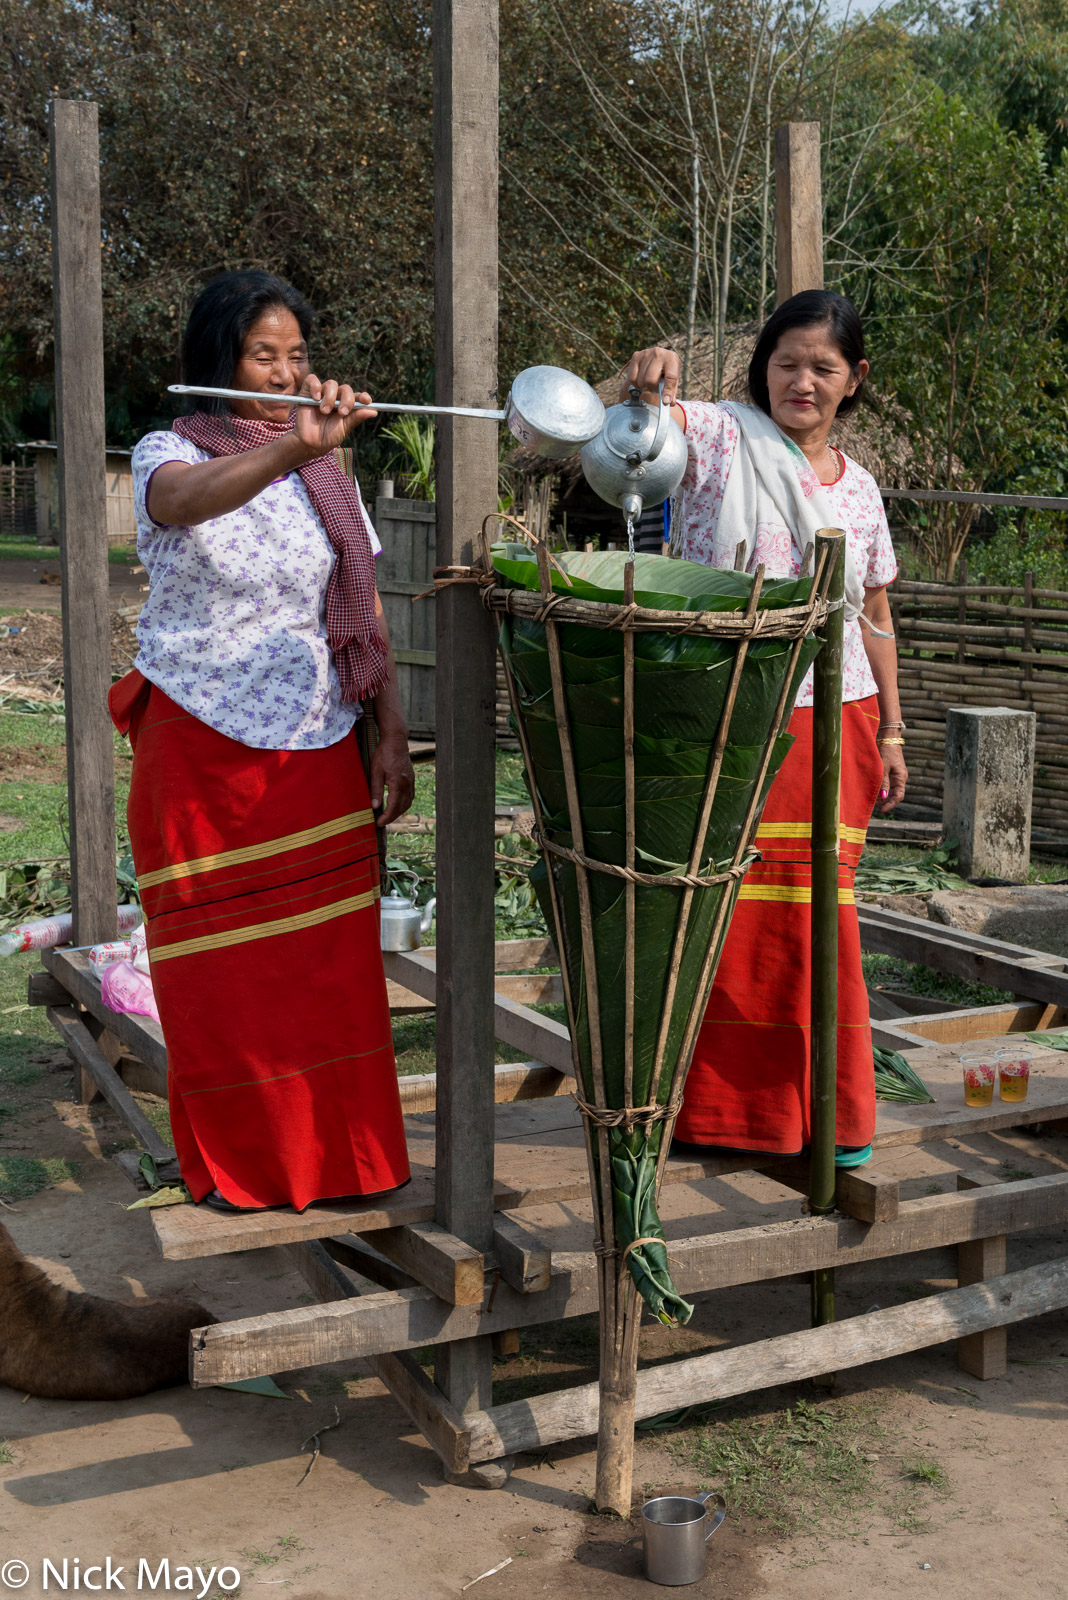 Adi, Arunachal Pradesh, Beer, Harvest Celebration, India, Preparing, photo